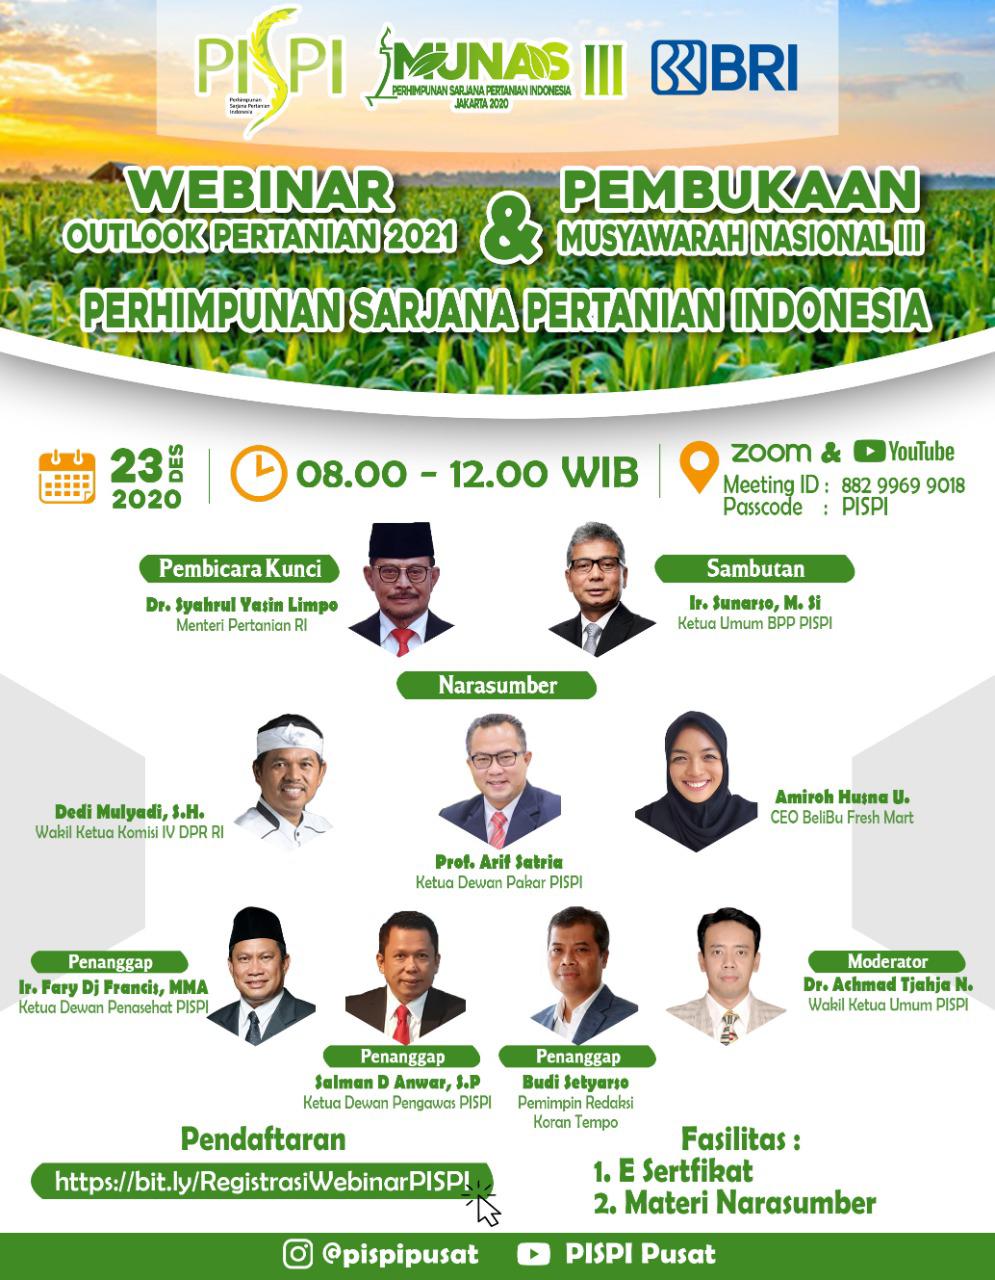 Meneropong Sektor Pertanian Indonesia Kedepan, PISPI Adakan Webinar dan Musyawarah Nasional